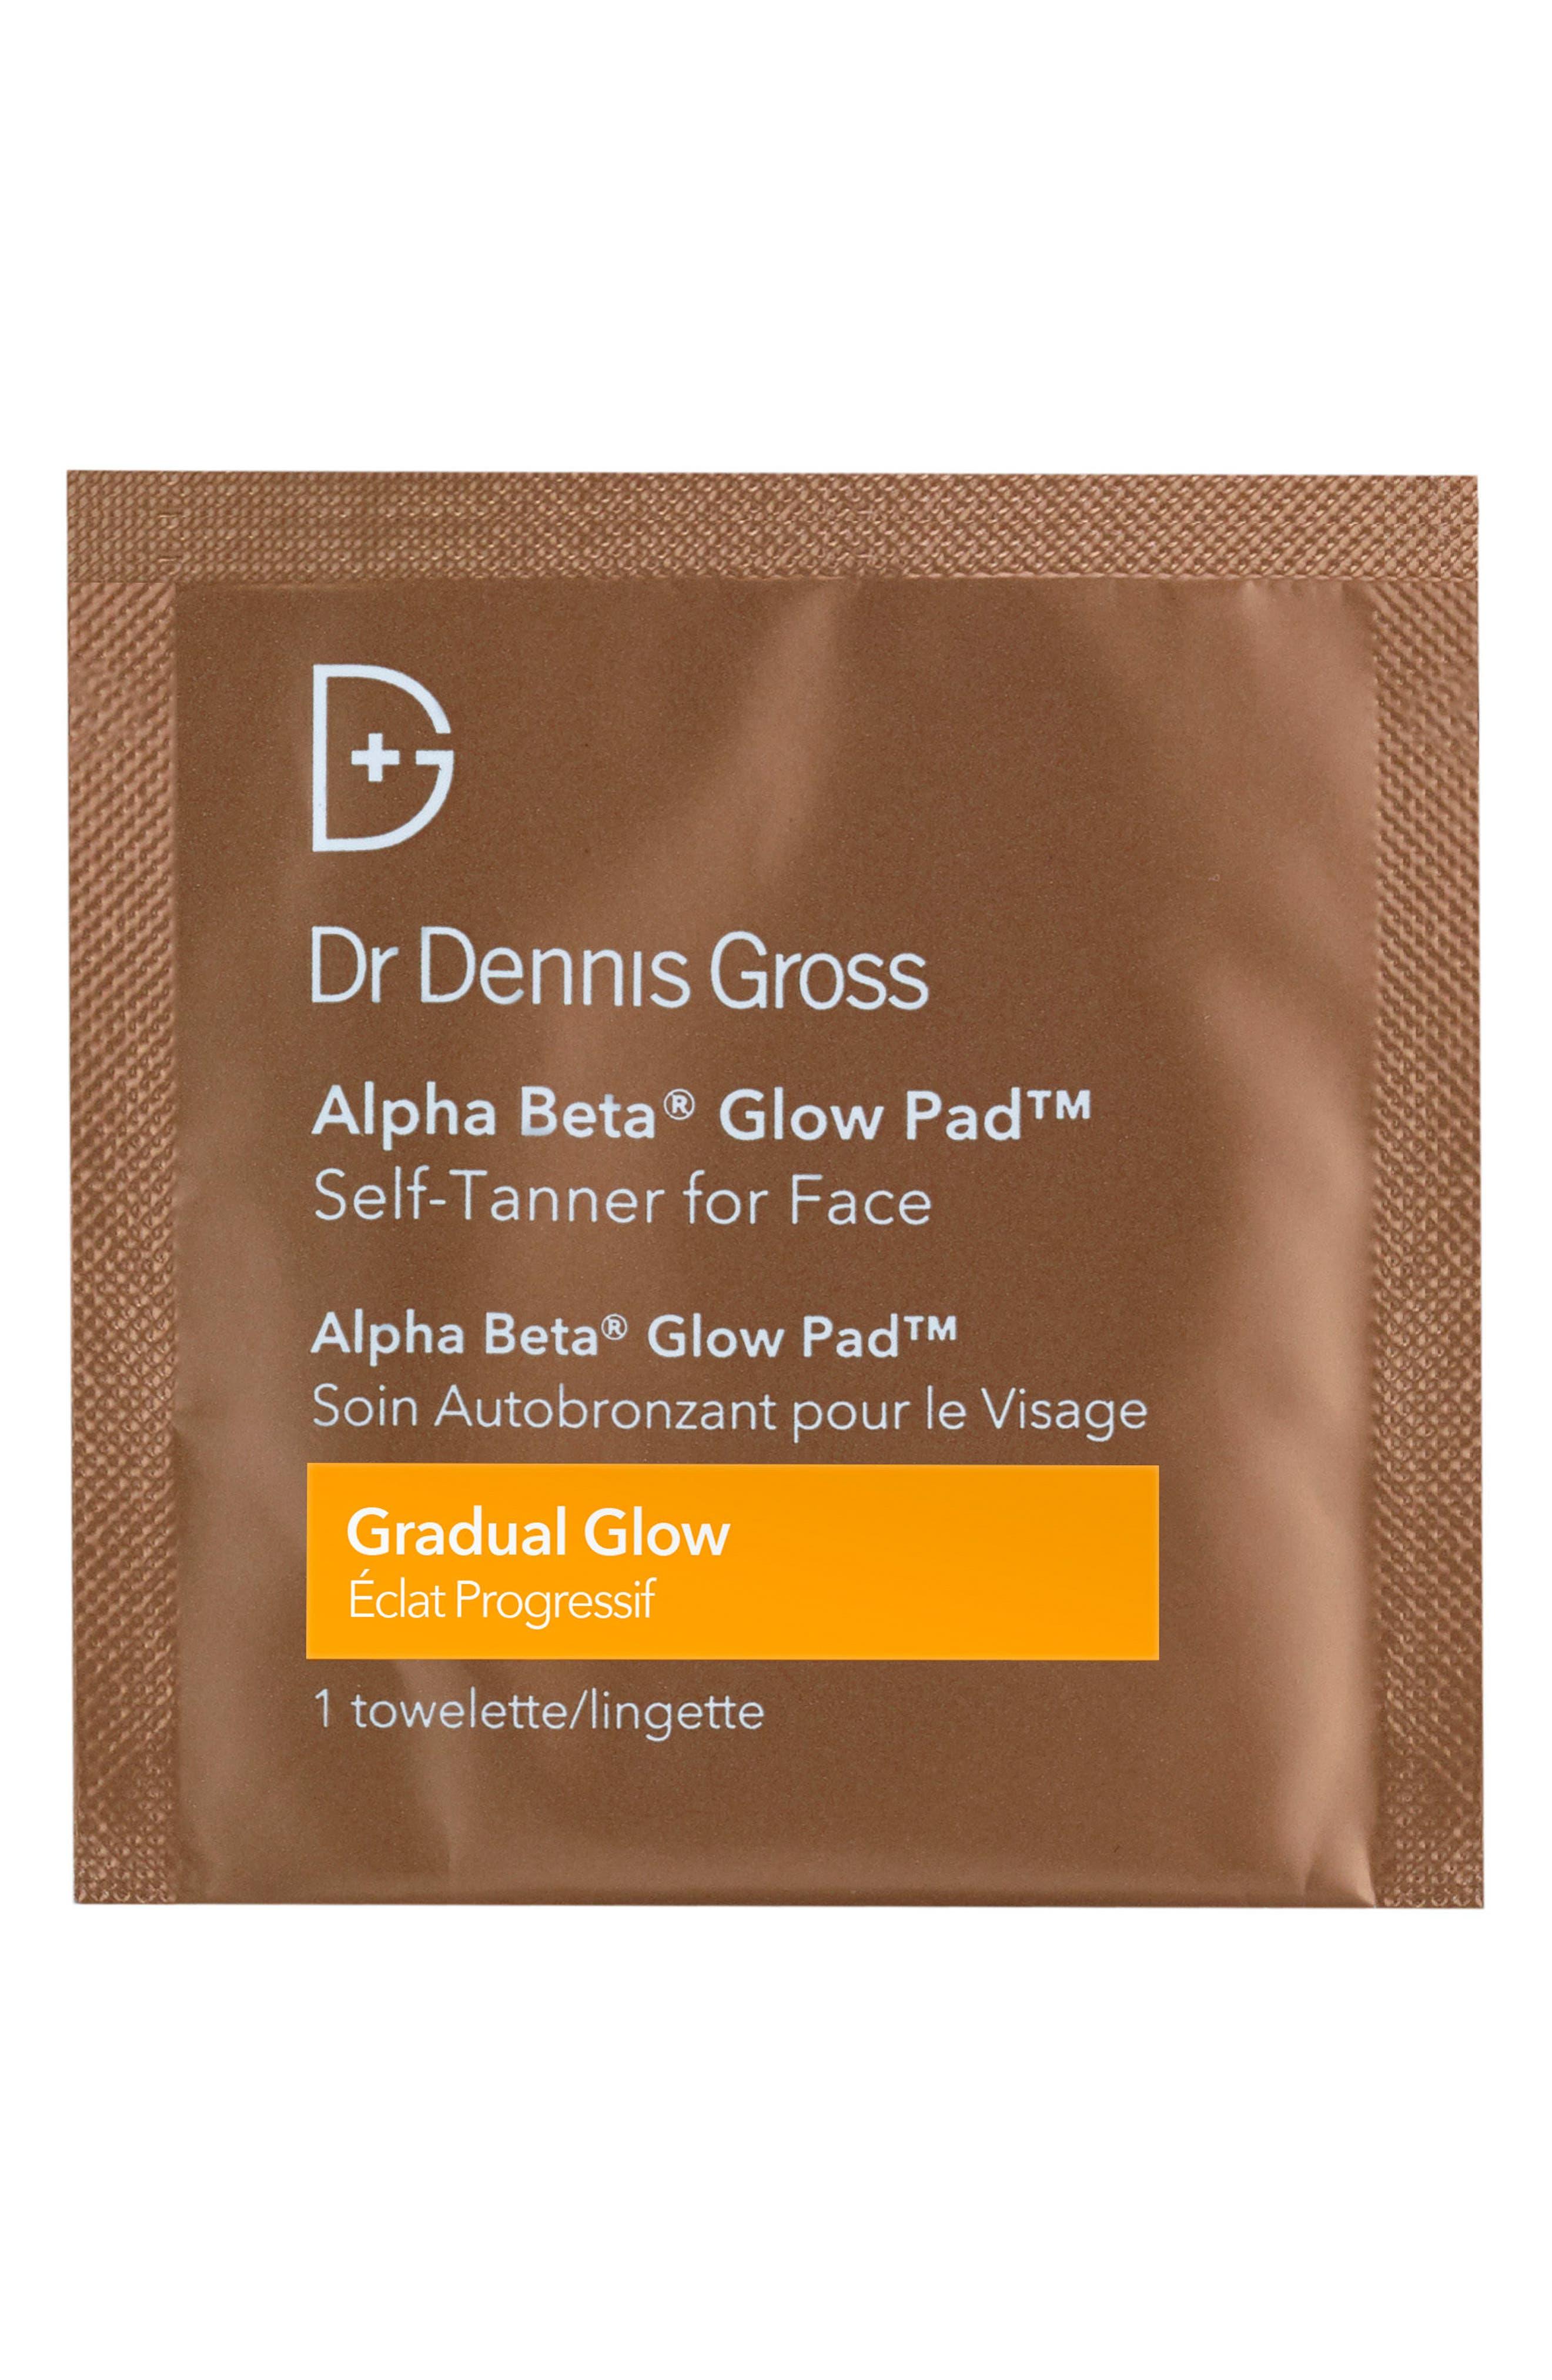 Dr. Dennis Gross Skincare Alpha Beta® Gradual Glow Pad Self-Tanner for Face